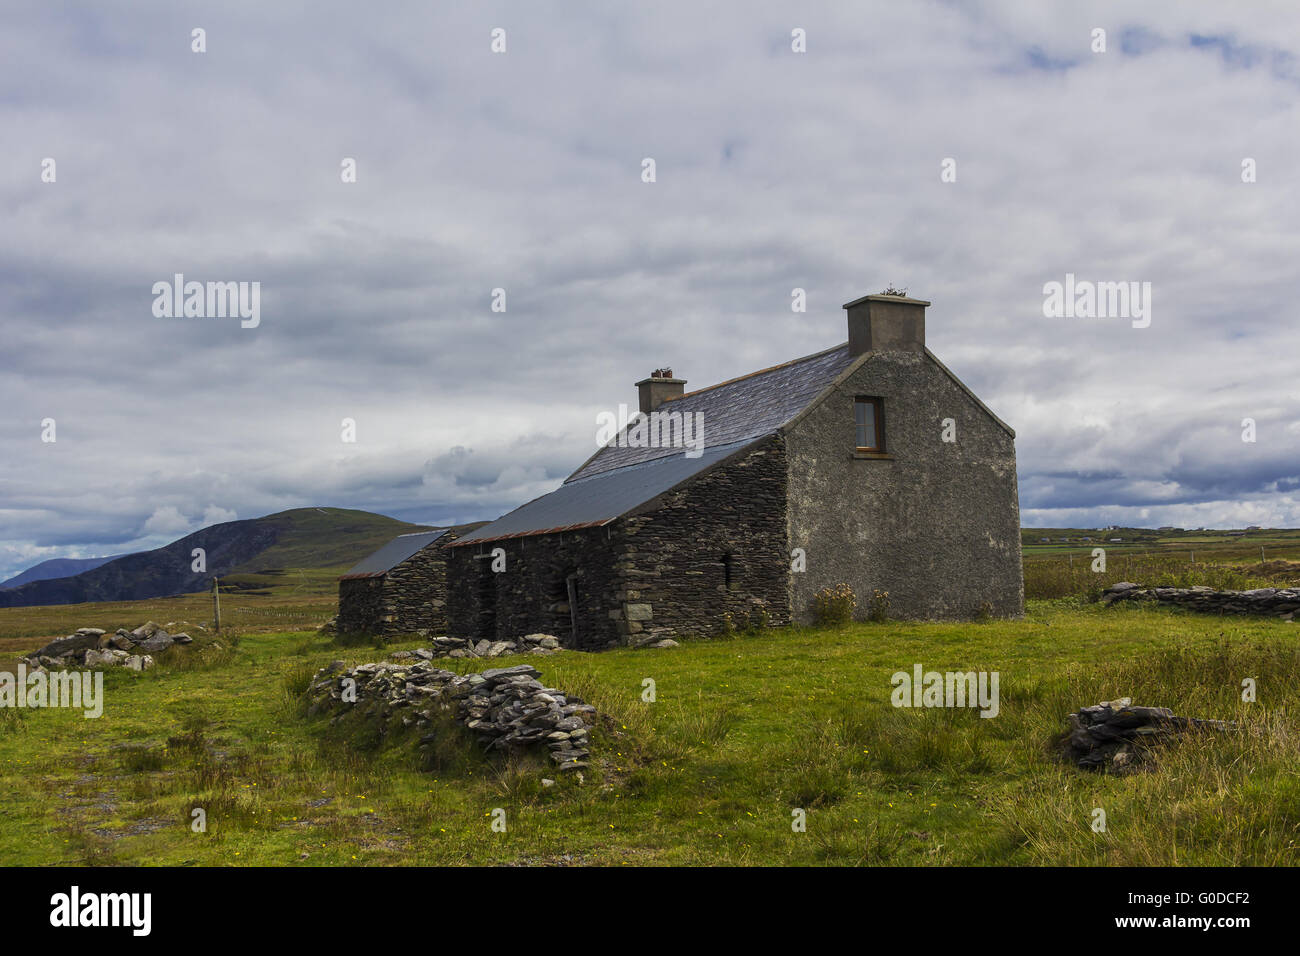 casa rural antiguo Imagen De Stock